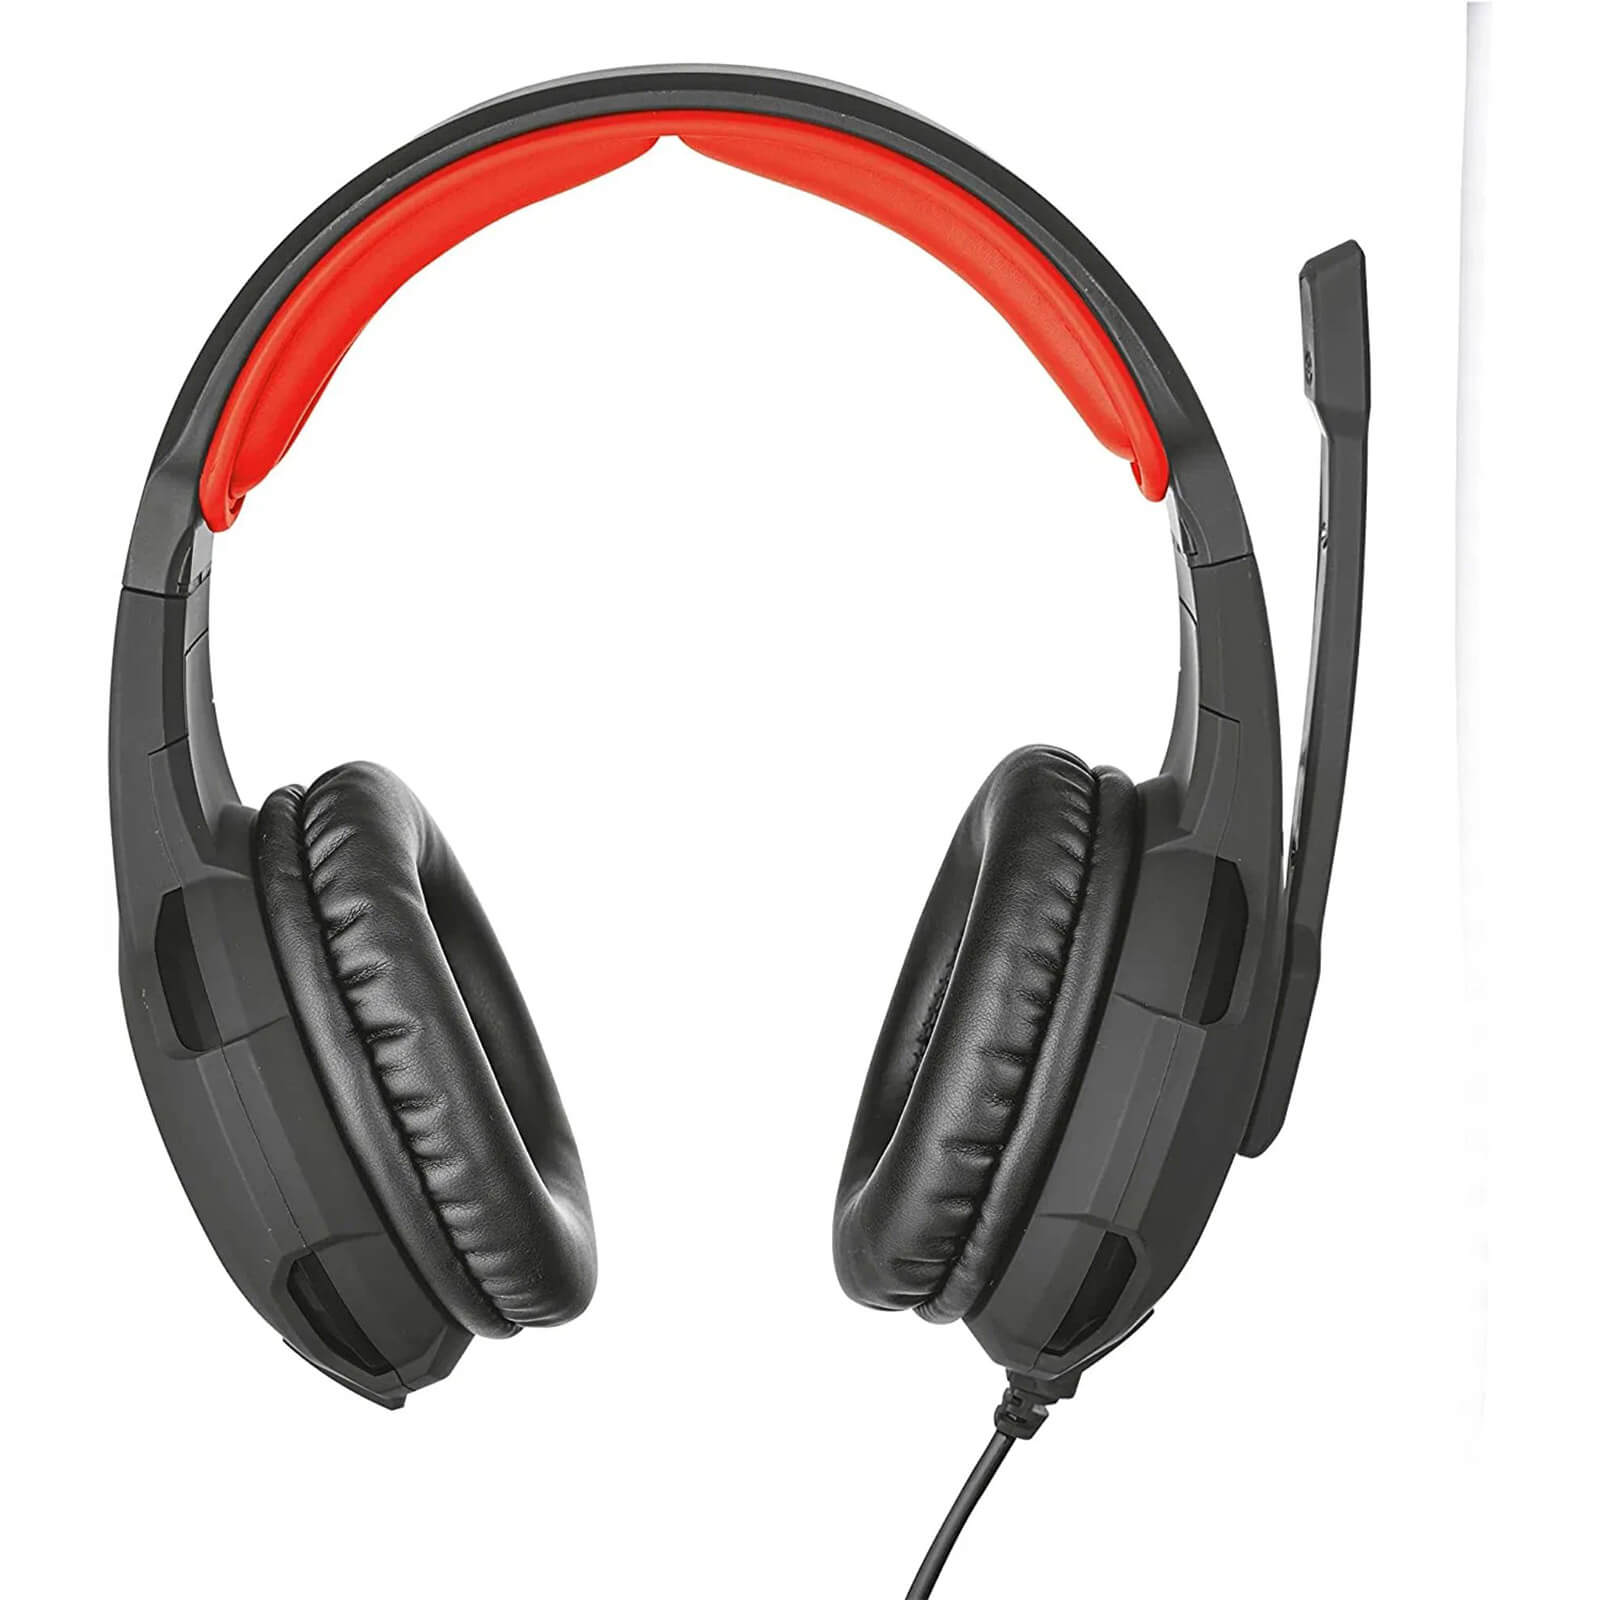 Image of Trust GXT 310 Radius Gaming Headset - Black